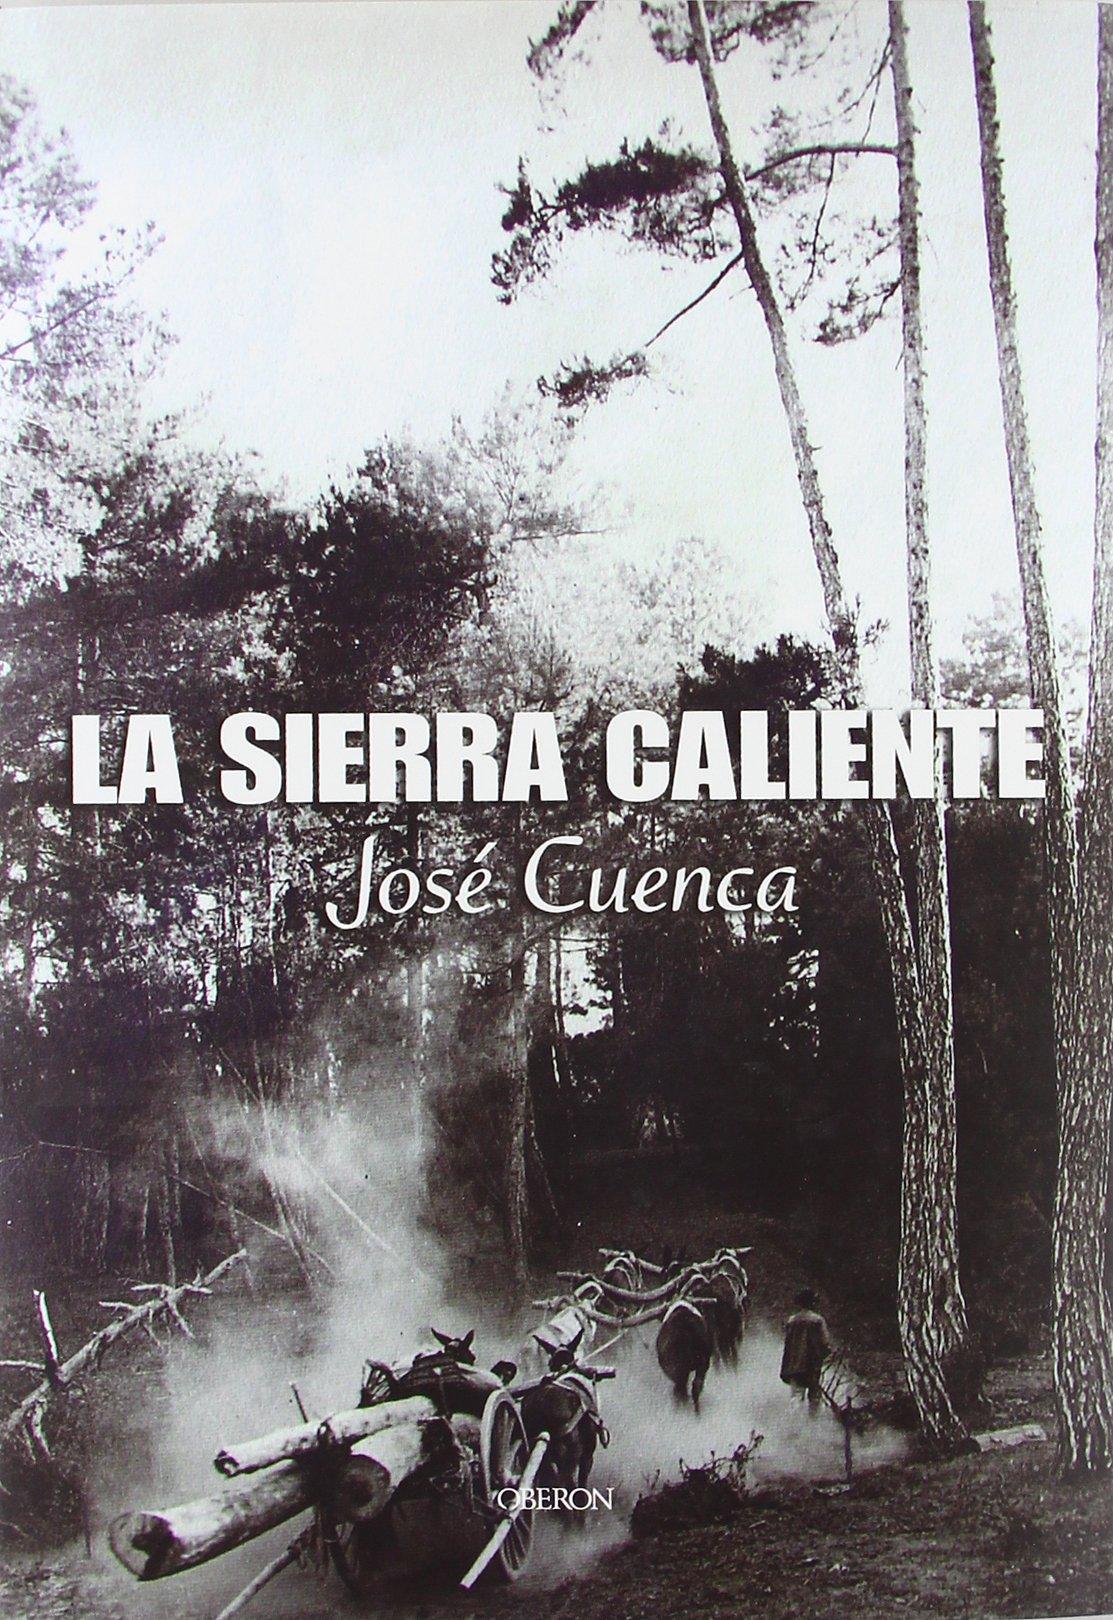 La sierra caliente: Memoria de la sierra de Segura: Amazon.es ...